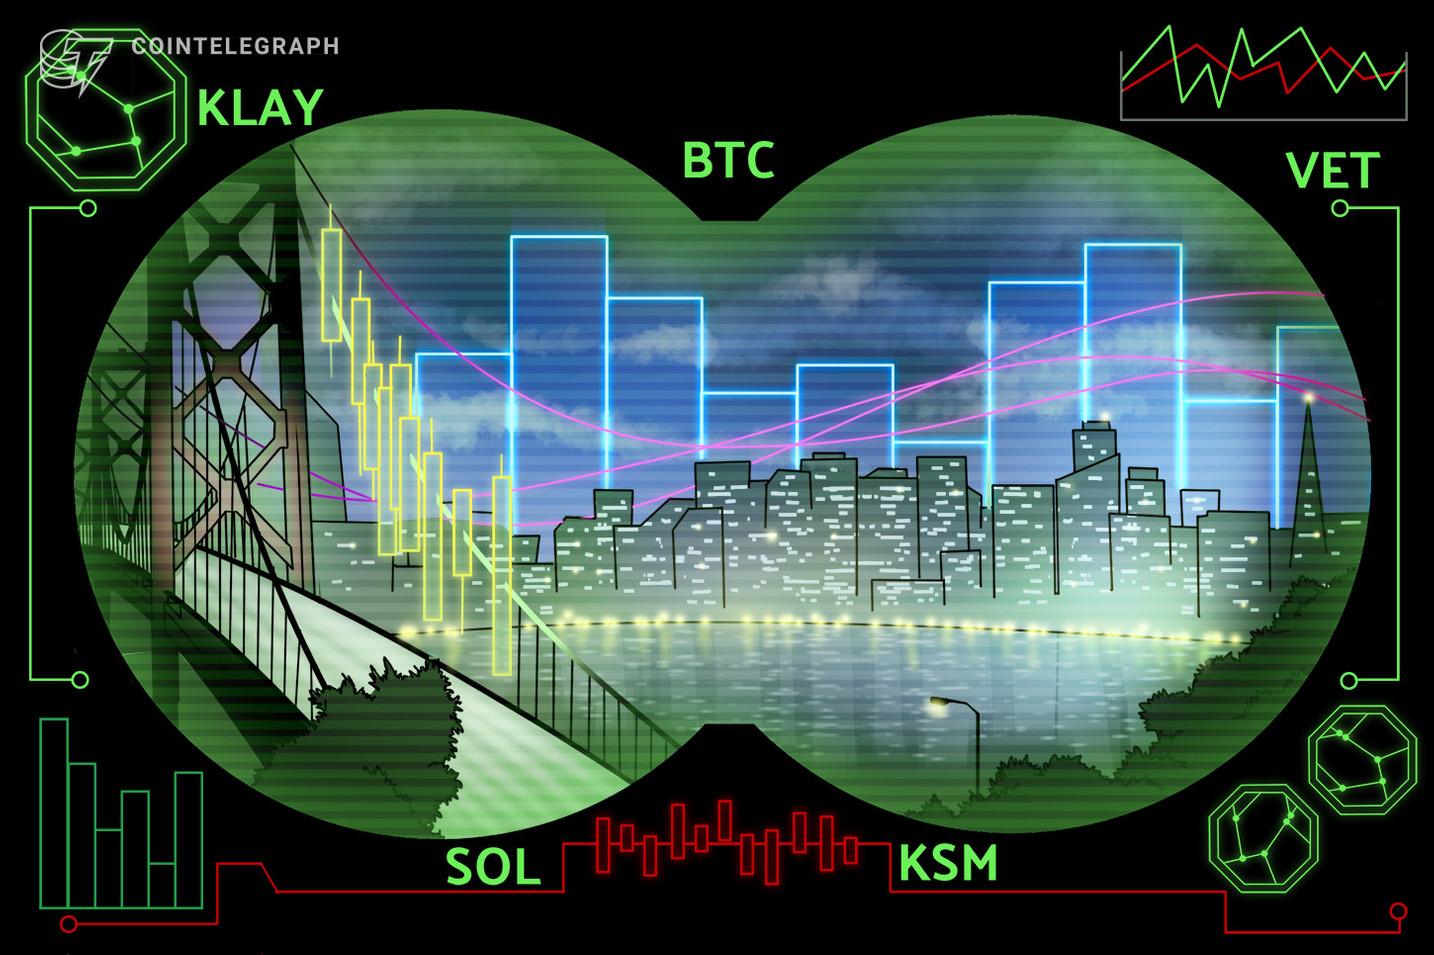 Top 5 cryptocurrencies to watch this week: BTC, KLAY, VET, SOL, KSM